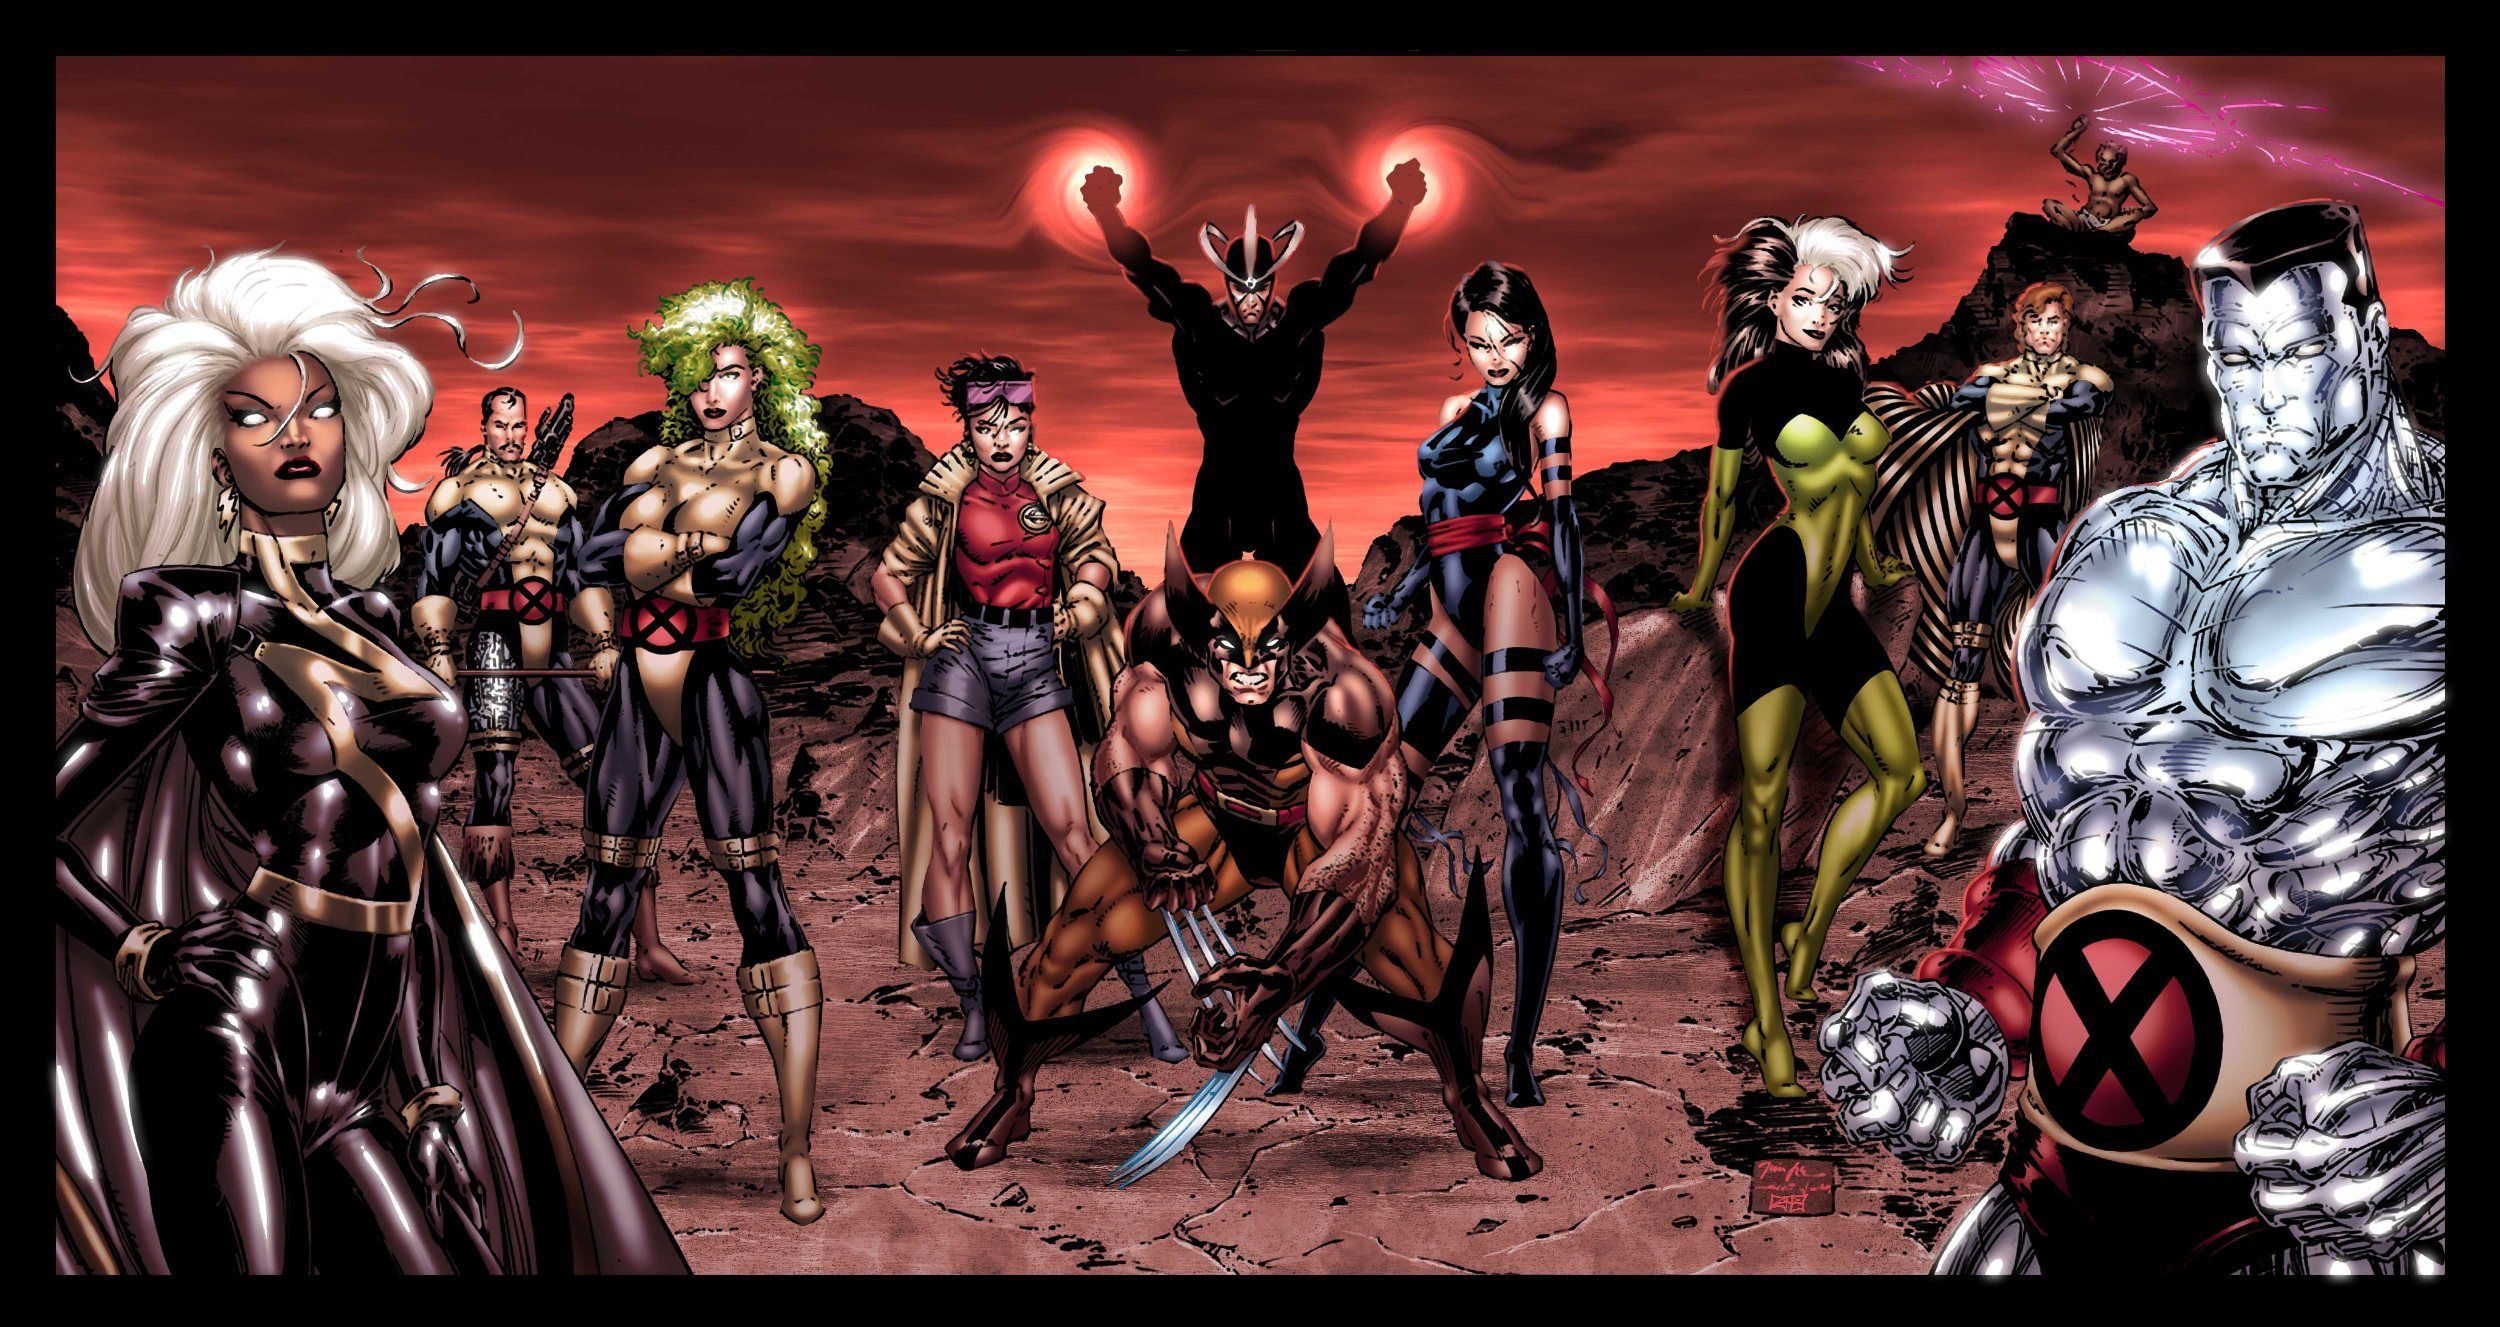 Top Wallpaper Marvel Xmen - b9472e2dd8bb21b2792c9fa3be71c933  Gallery_856135.jpg